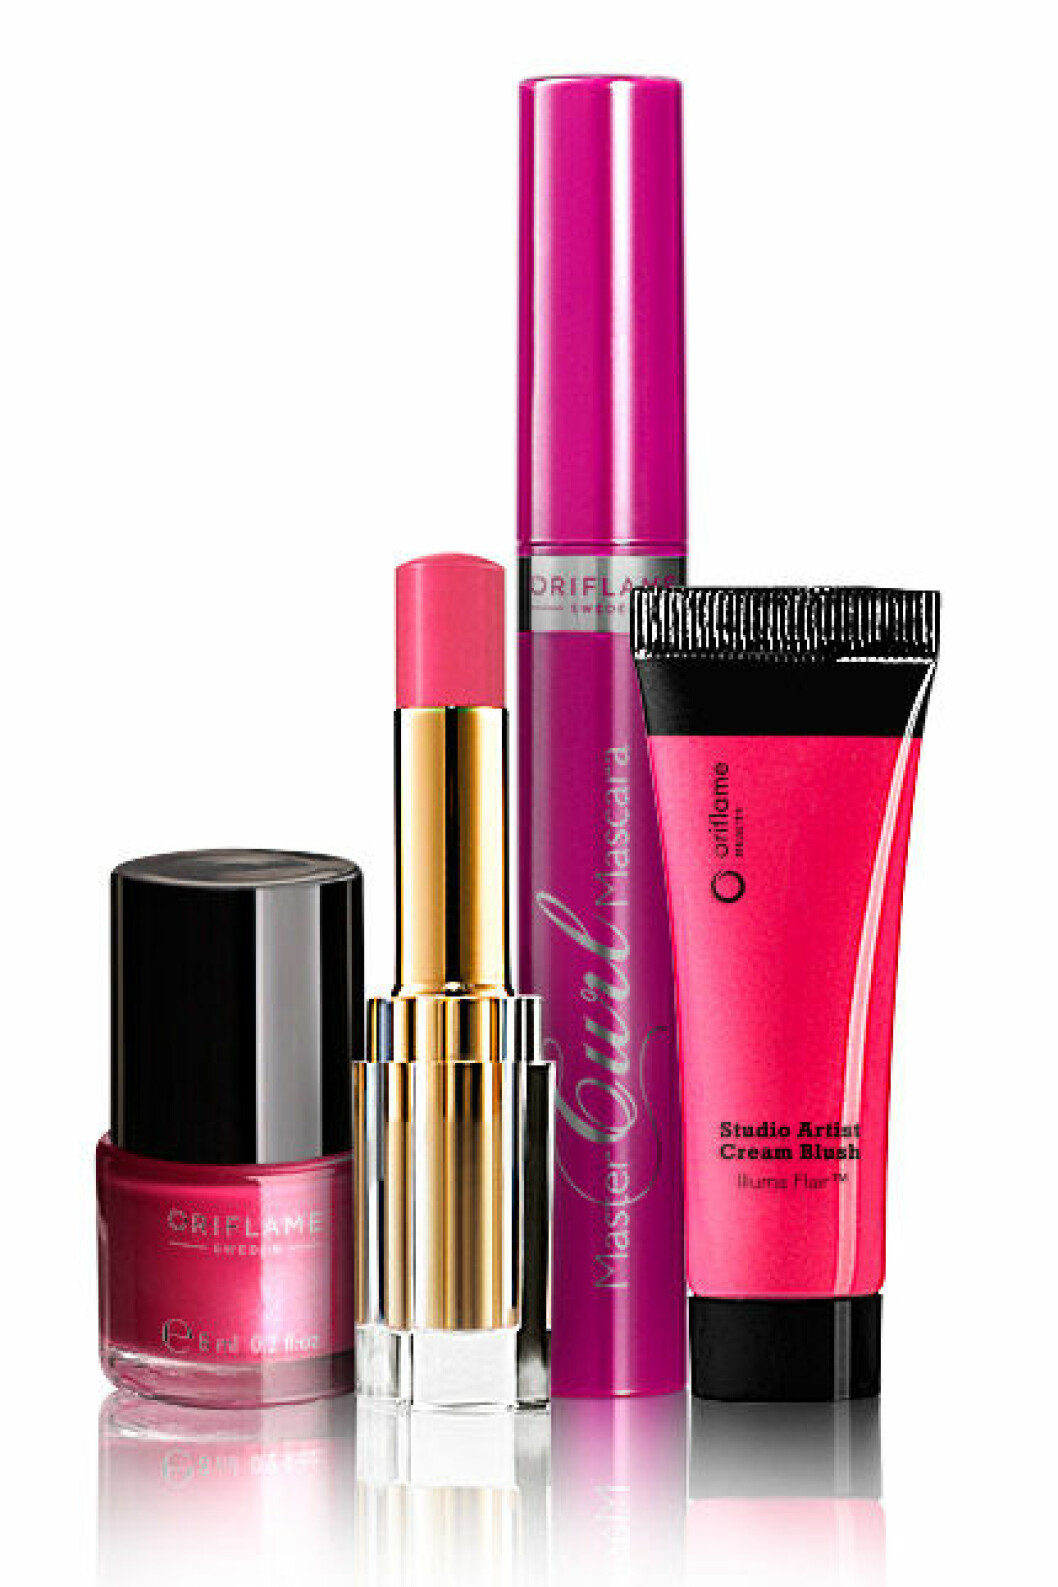 Makeupkitet Pink by Elsa Ekman för Oriflame kostar 279 kr.